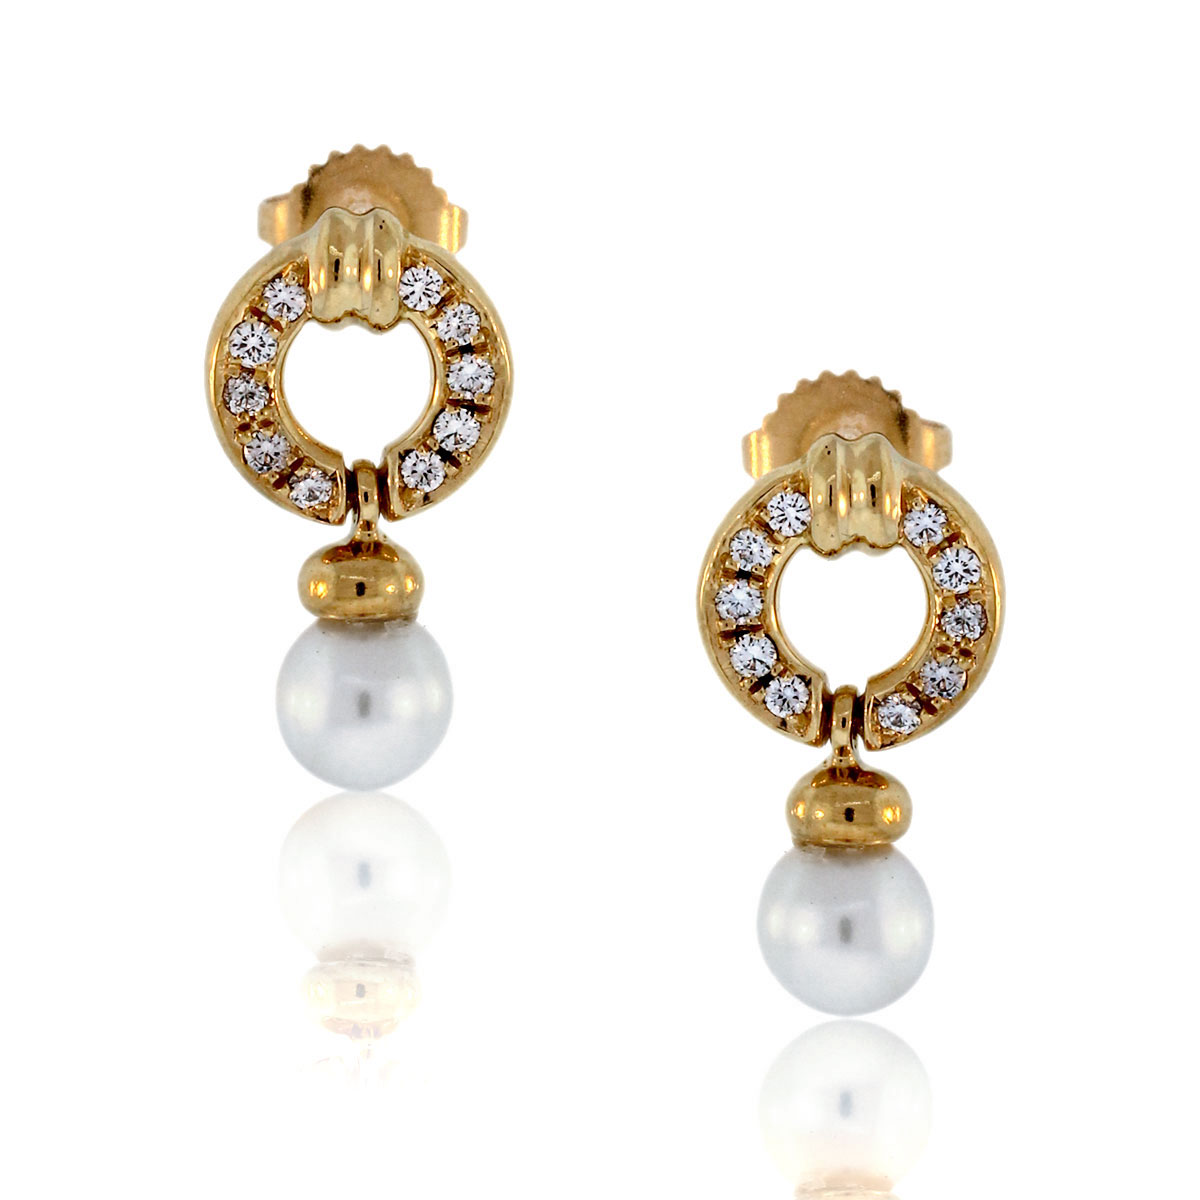 Tiffany & Co. 18K Yellow Gold Diamond & Pearl Earrings